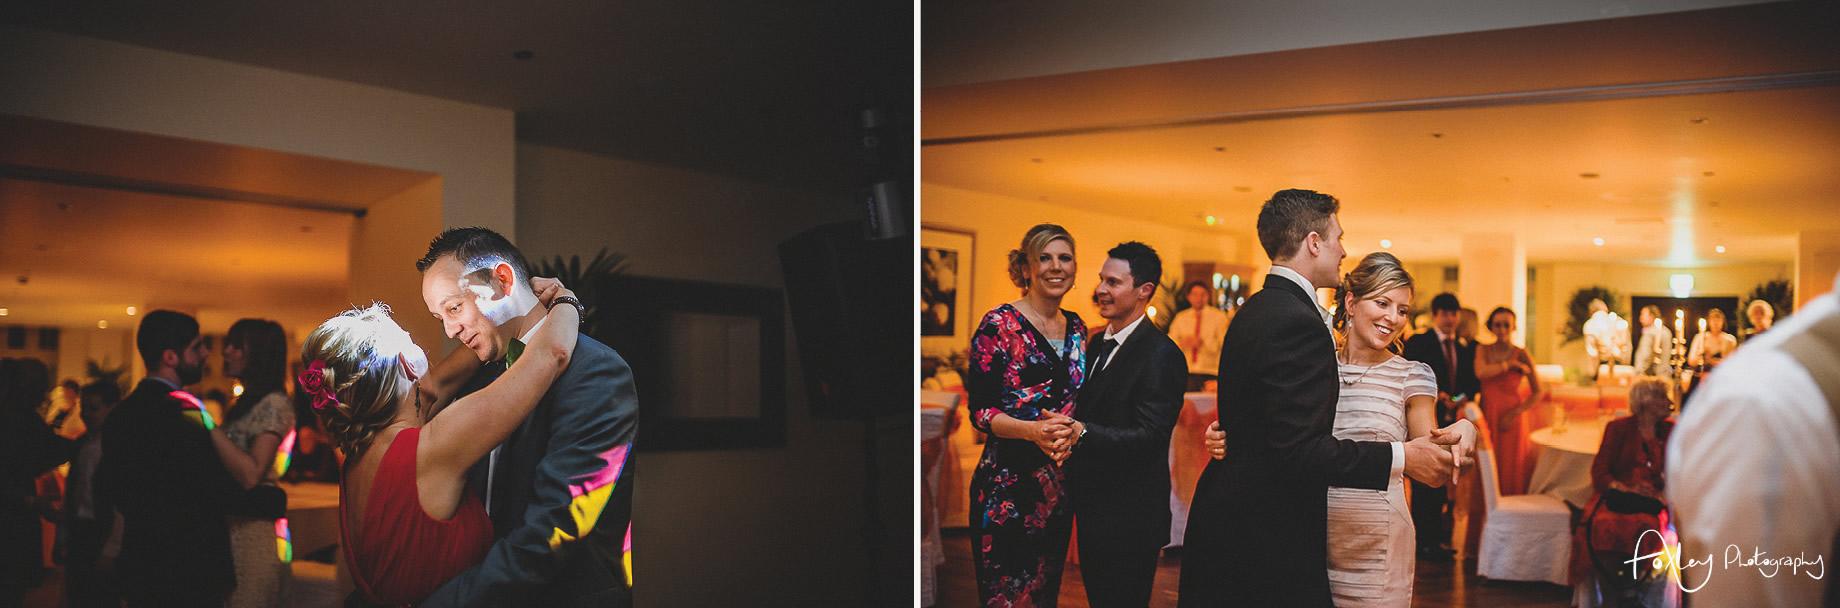 Gemma and Lewis' Wedding at Mitton Hall 157